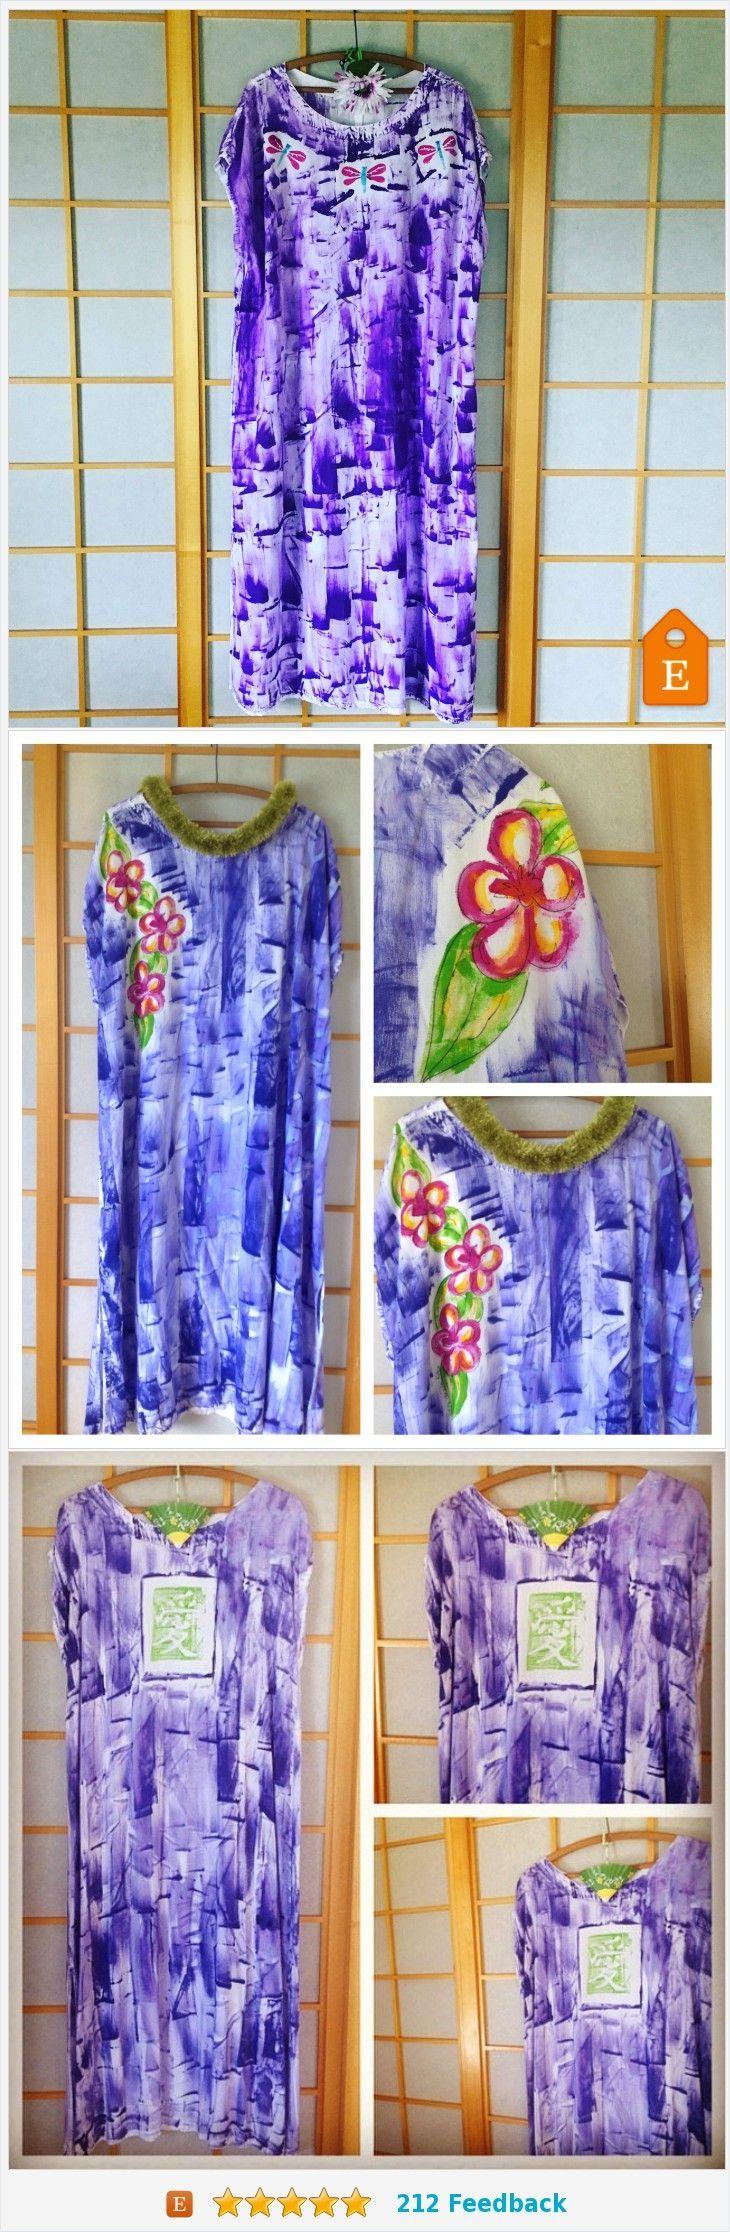 Awesome Hawaiian Style Dresses Resort Wear - Muumuu - Rayon Maxi Dress - Hand Painted Dress #etsyseller #etsyha... Check more at http://24store.gq/fashion/hawaiian-style-dresses-resort-wear-muumuu-rayon-maxi-dress-hand-painted-dress-etsyseller-etsyha/